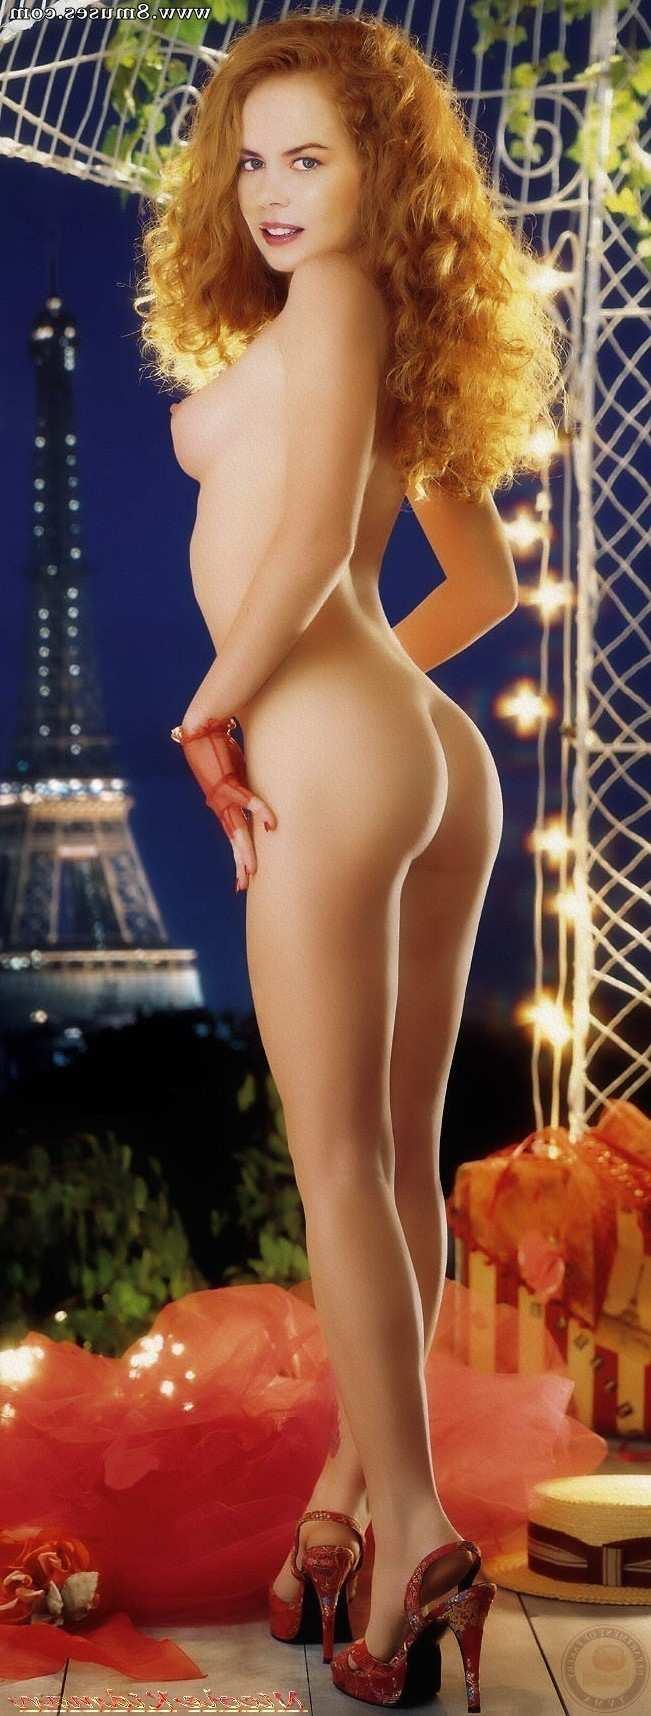 Fake-Celebrities-Sex-Pictures/Nicole-Kidman Nicole_Kidman__8muses_-_Sex_and_Porn_Comics_354.jpg